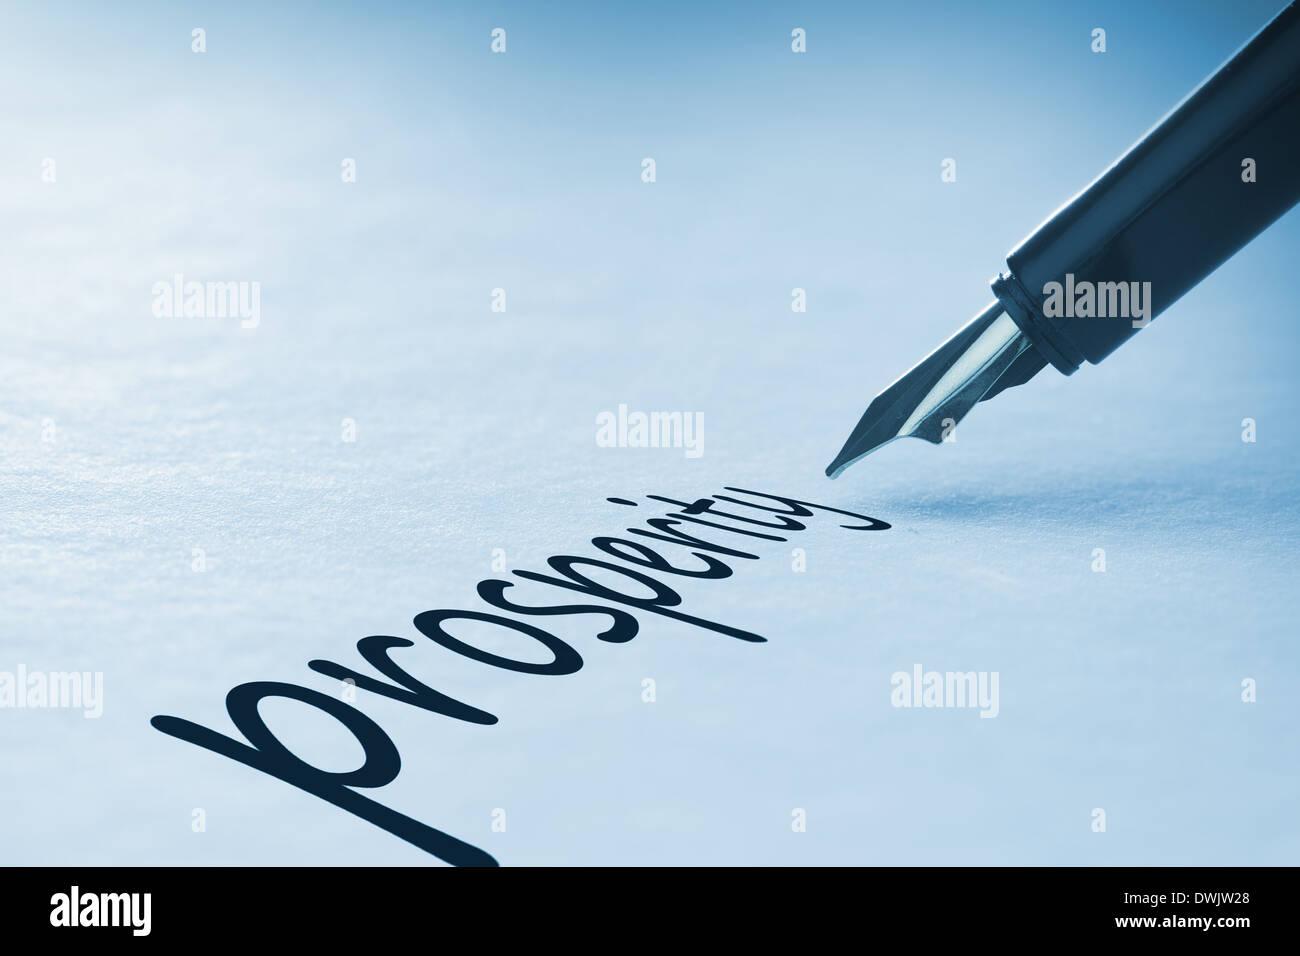 Fountain pen writing Prosperity - Stock Image